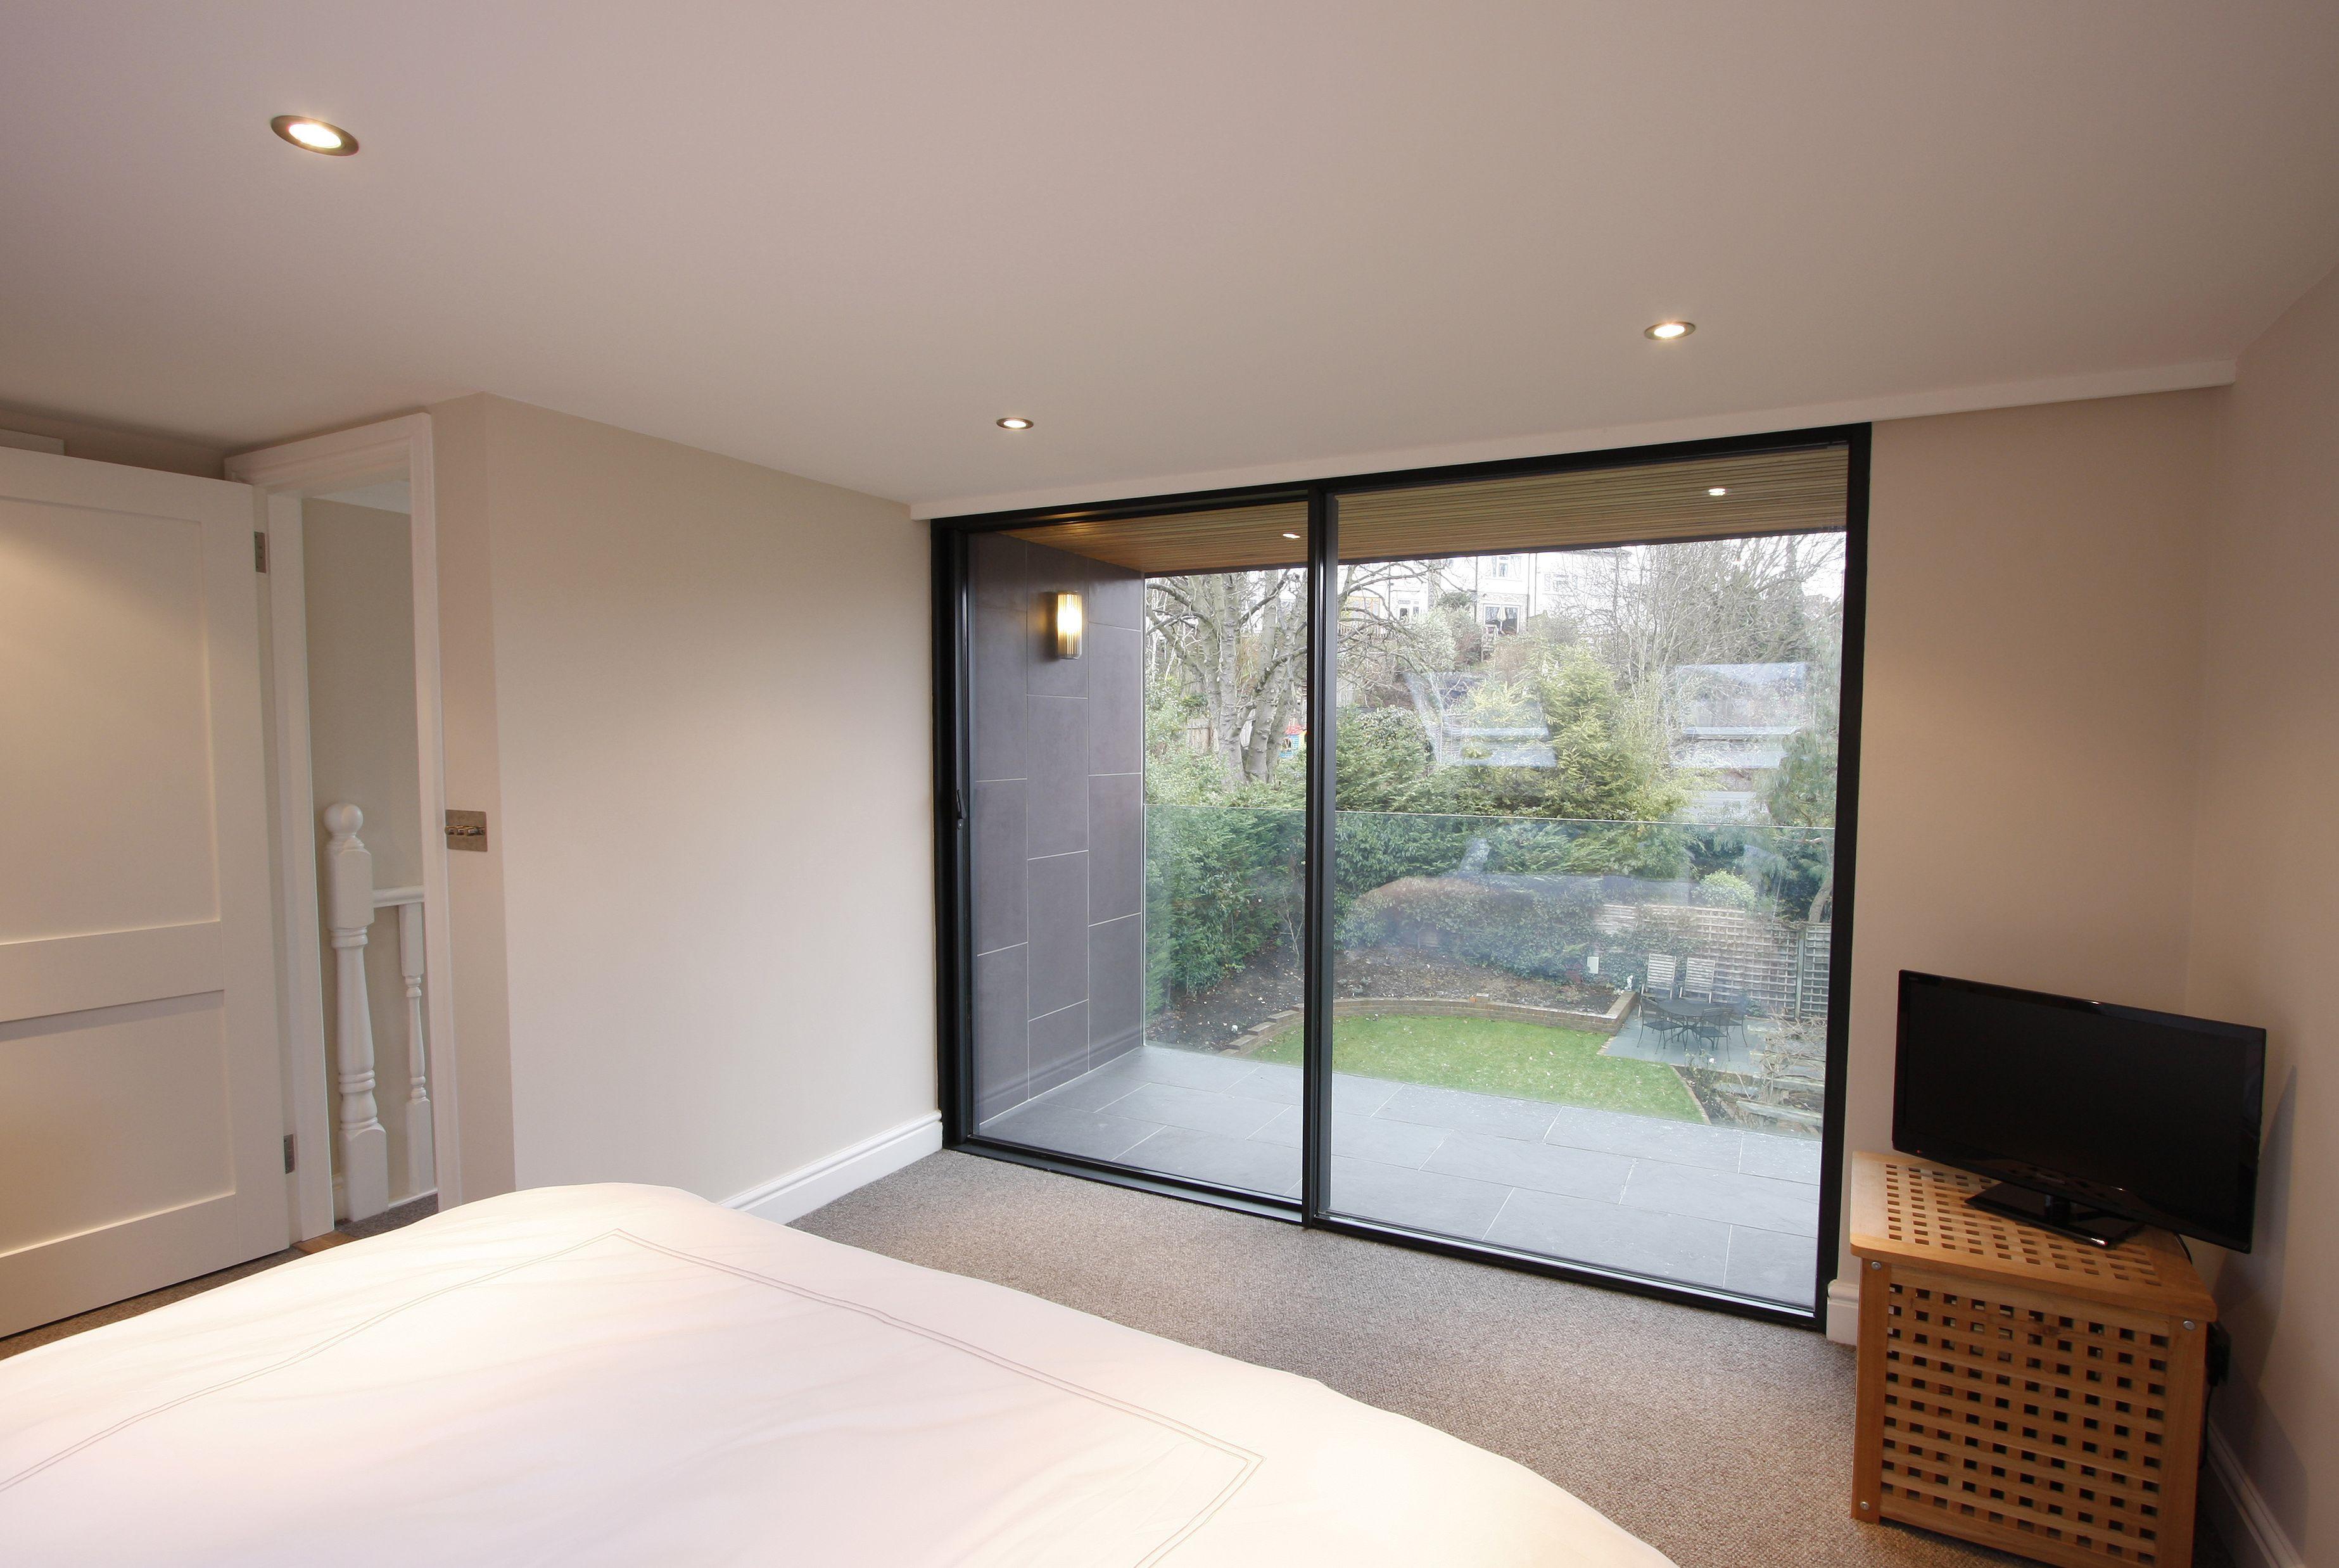 Www Iqglassuk Com Minimal Windows Sliding Doors To Master Bedroom And Balcony Minimal Windows Slim Framed Sliding Doors Bedroom Windows